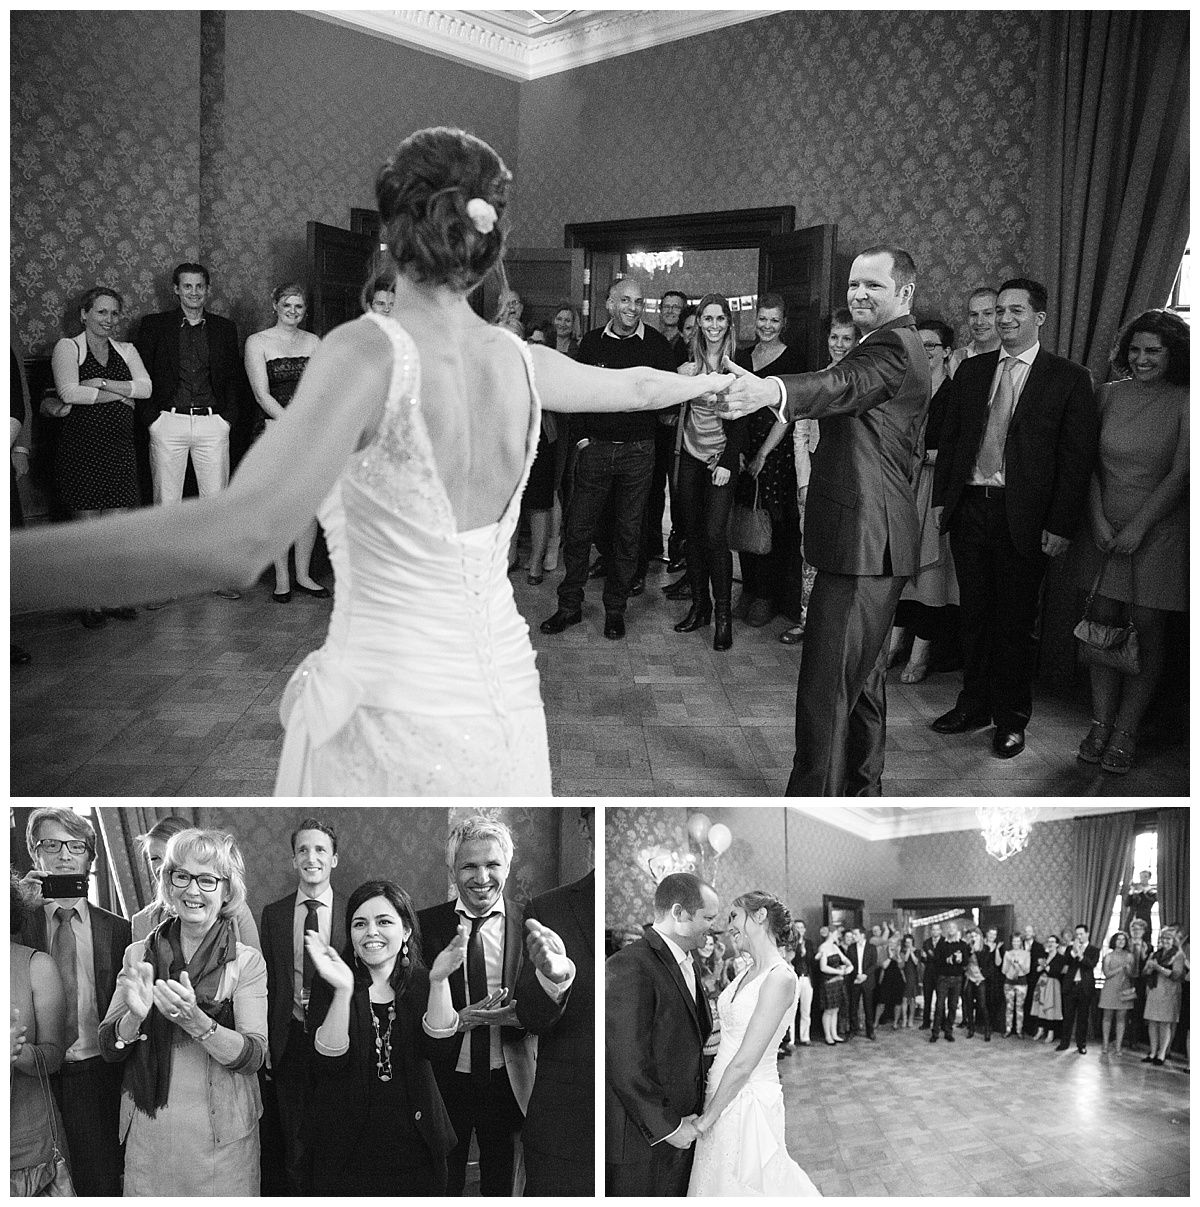 bruidsfotografie-trouwreportage-huwelijksfotografie-bruidsfotograaf-feestfotografie-Elise en Maarten-146.jpg